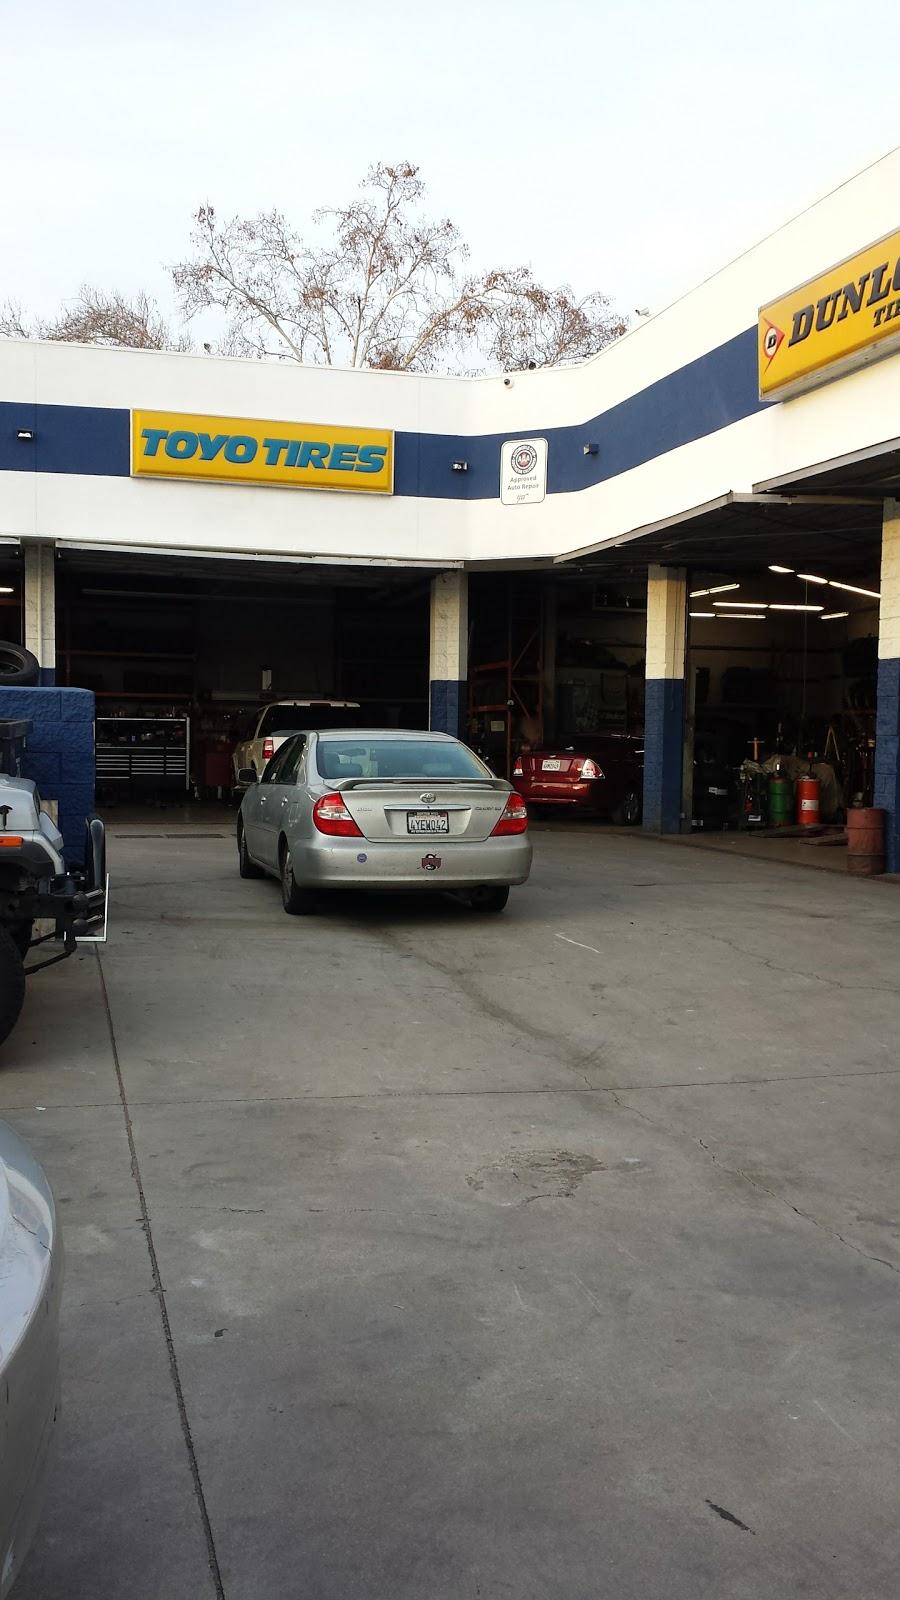 Fox Tire & Auto - car repair    Photo 2 of 6   Address: 19321 Roscoe Blvd, Northridge, CA 91324, USA   Phone: (818) 886-4122